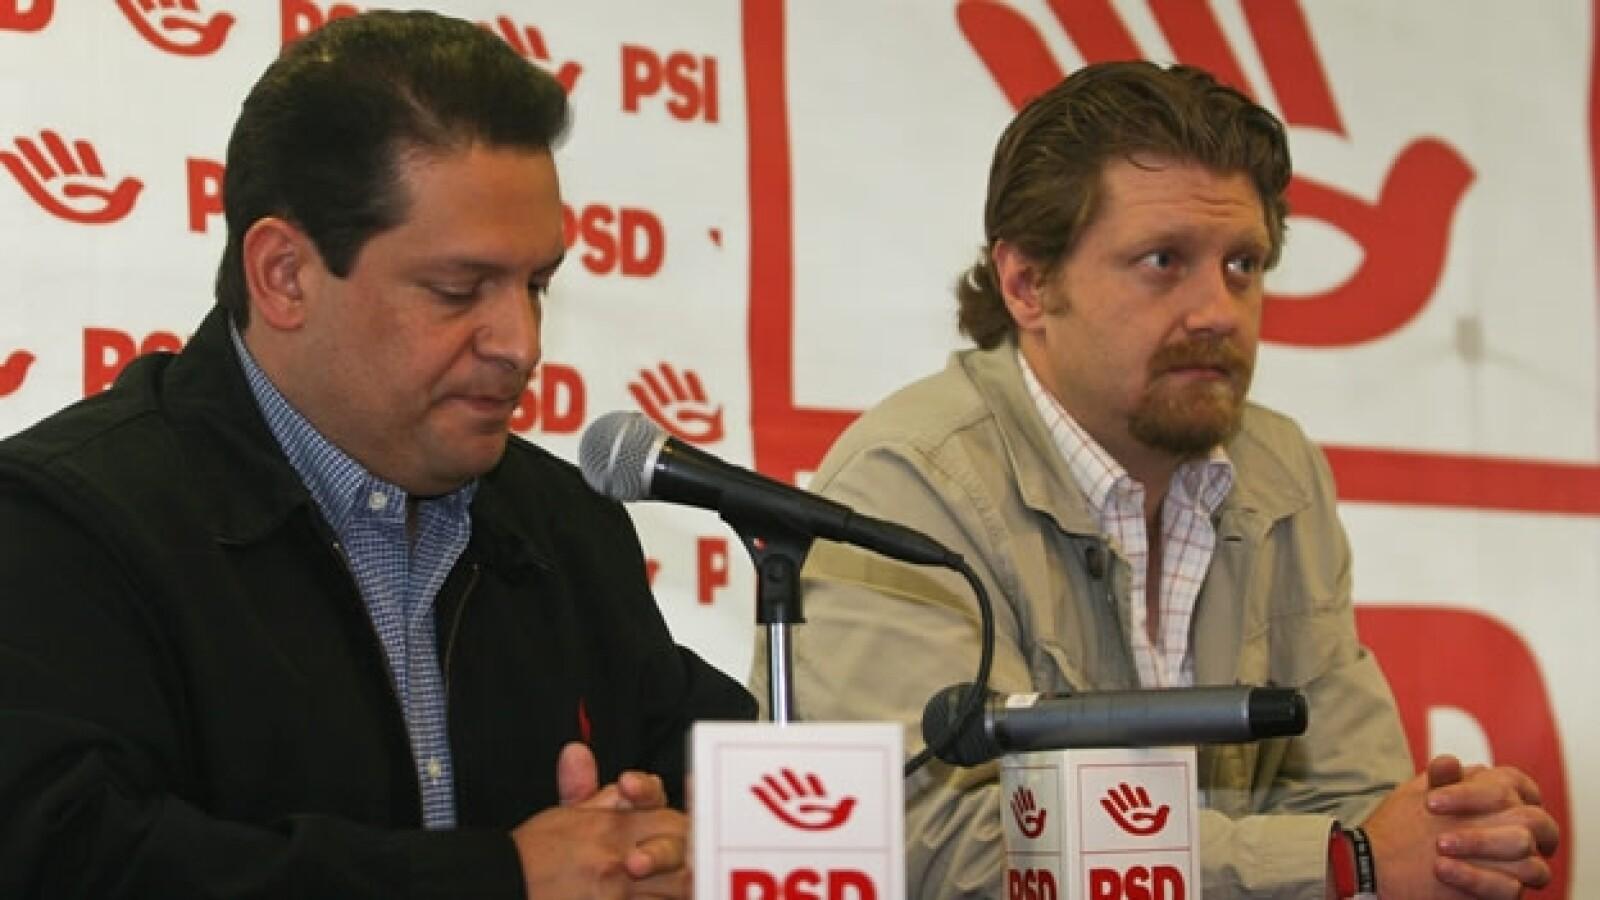 Partidos extintos-PSD